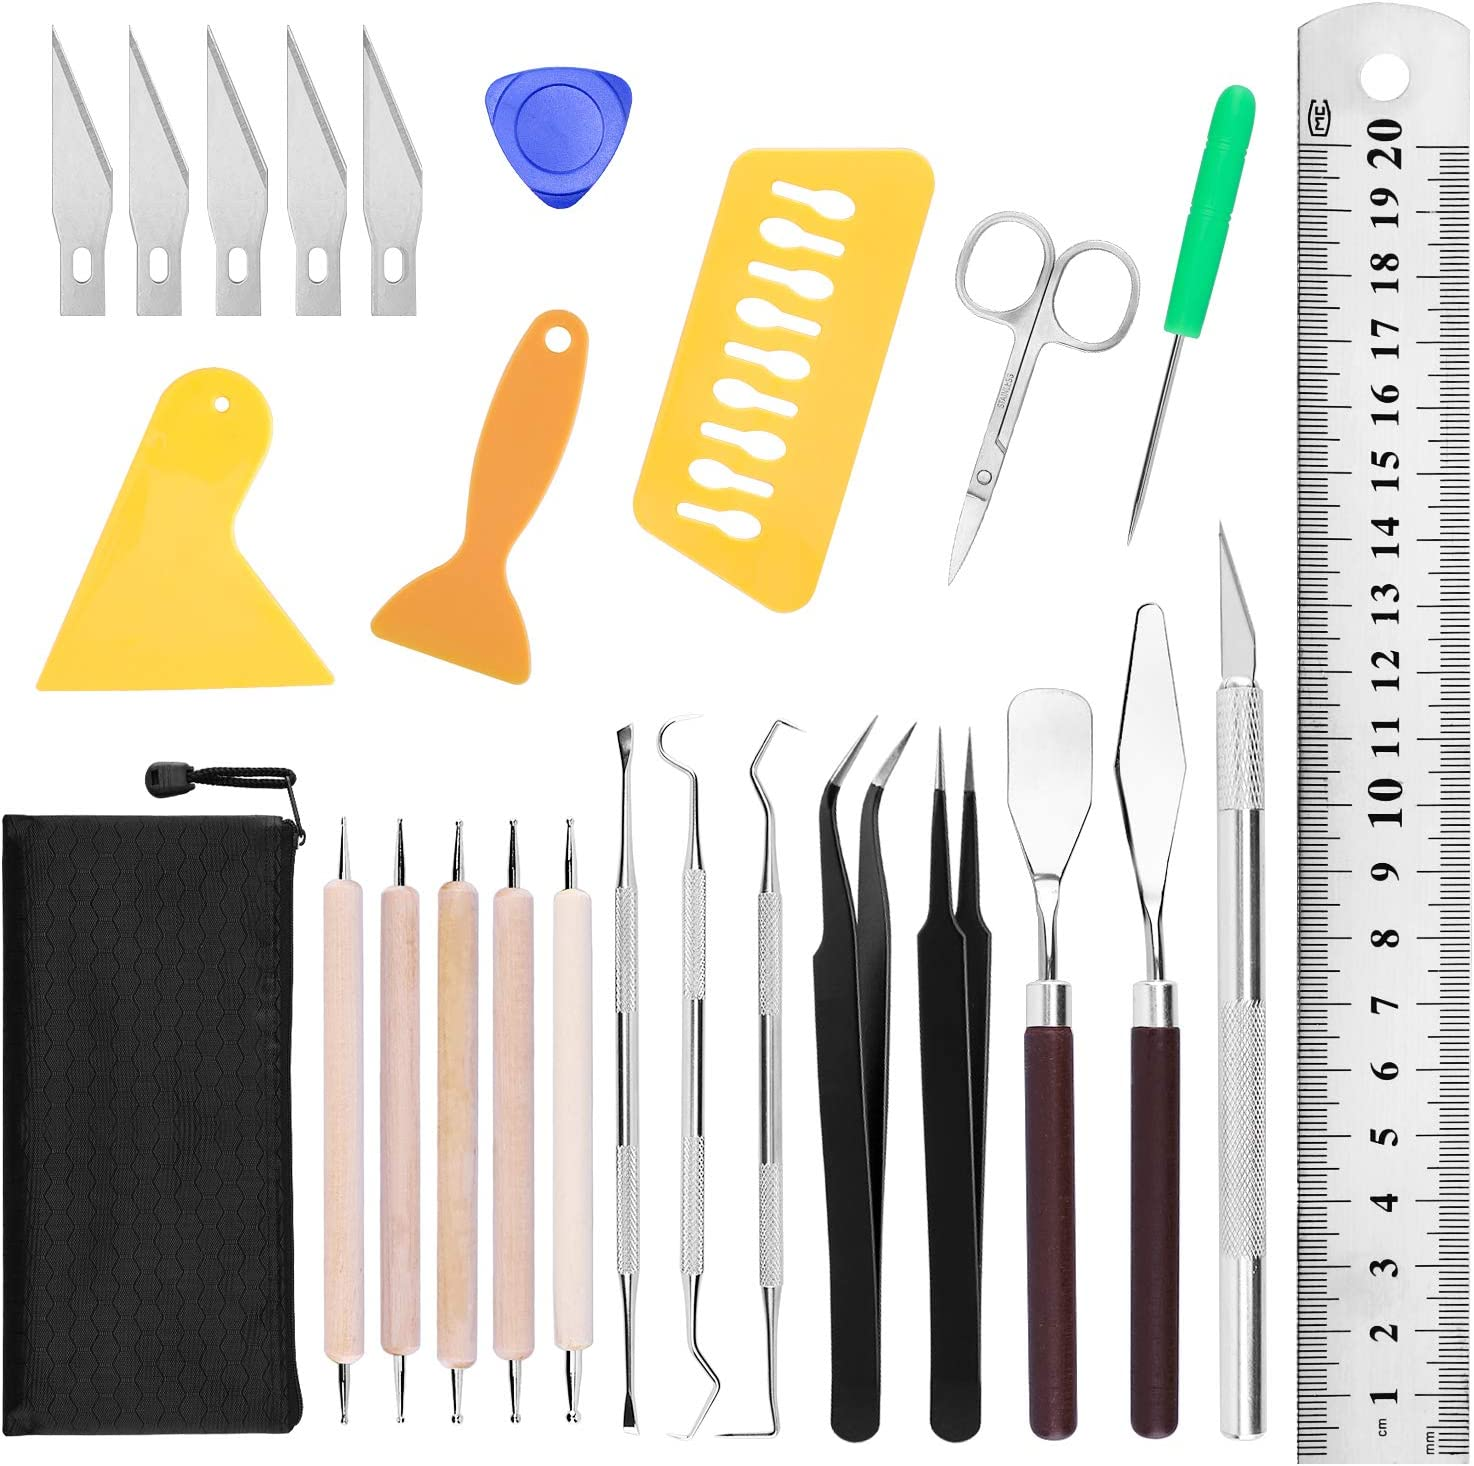 Famomatk 26PCS Craft Weeding Tools Set for Vinyl,Craft Basic Set Vinyl Weeding Tool Kit for Silhouettes,Cameos,Lettering,Cutting,Splicing